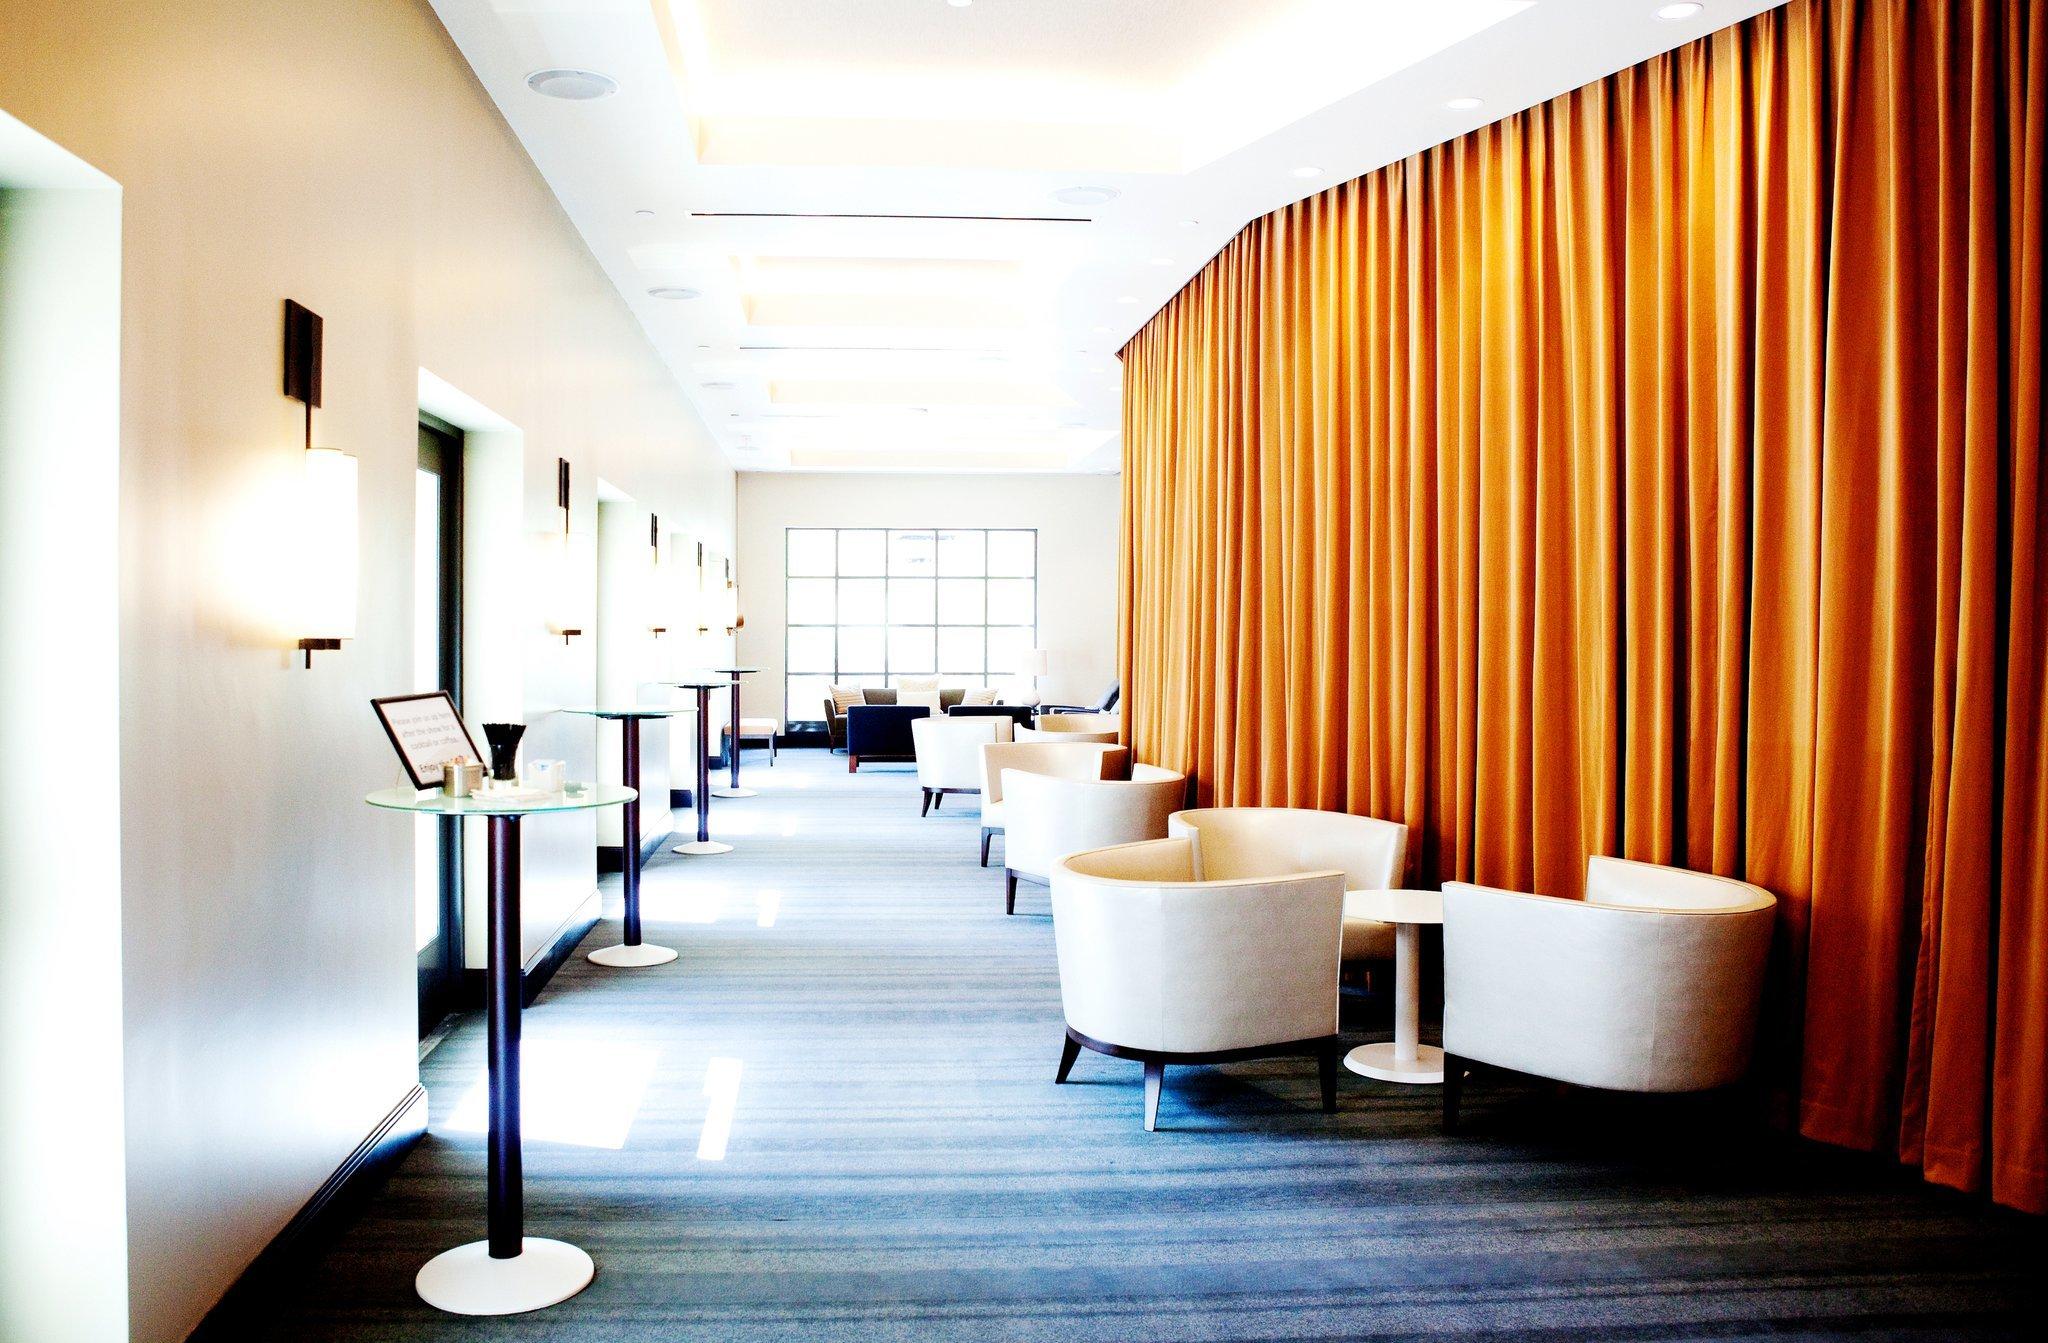 Herberger Theater Center - Art Gallery & Bob's Spot Gallery Lounge